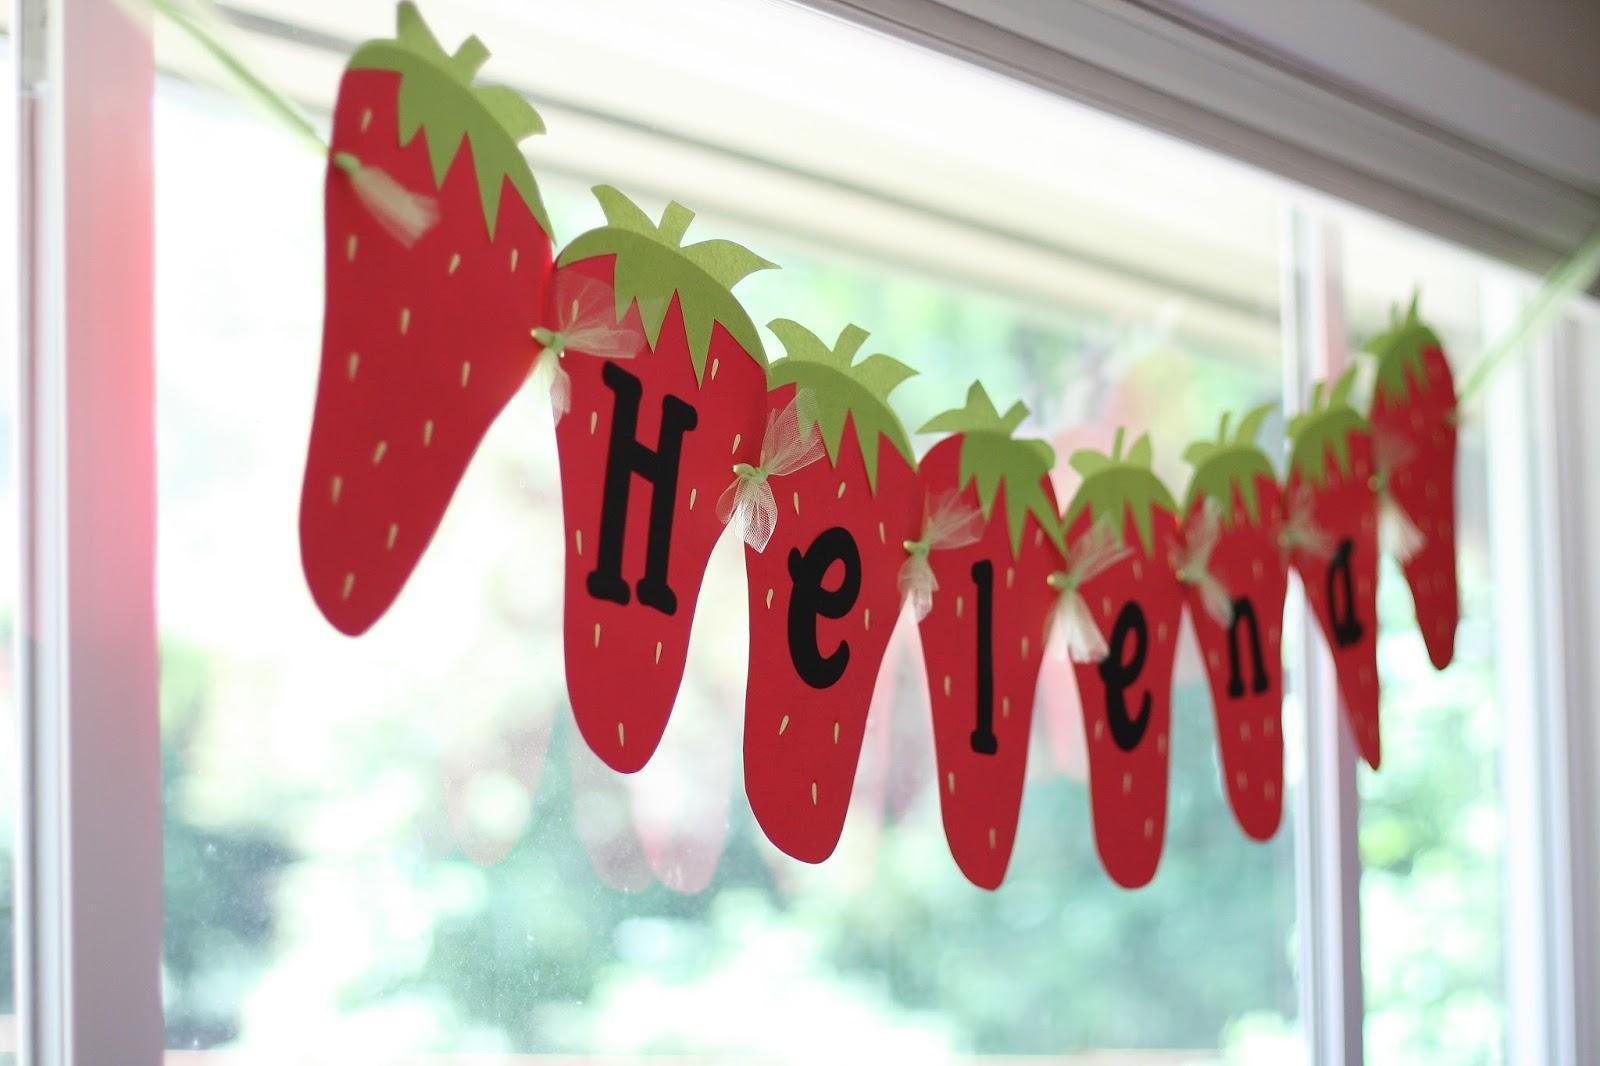 baby shower-neuf mois-fraise-banderole